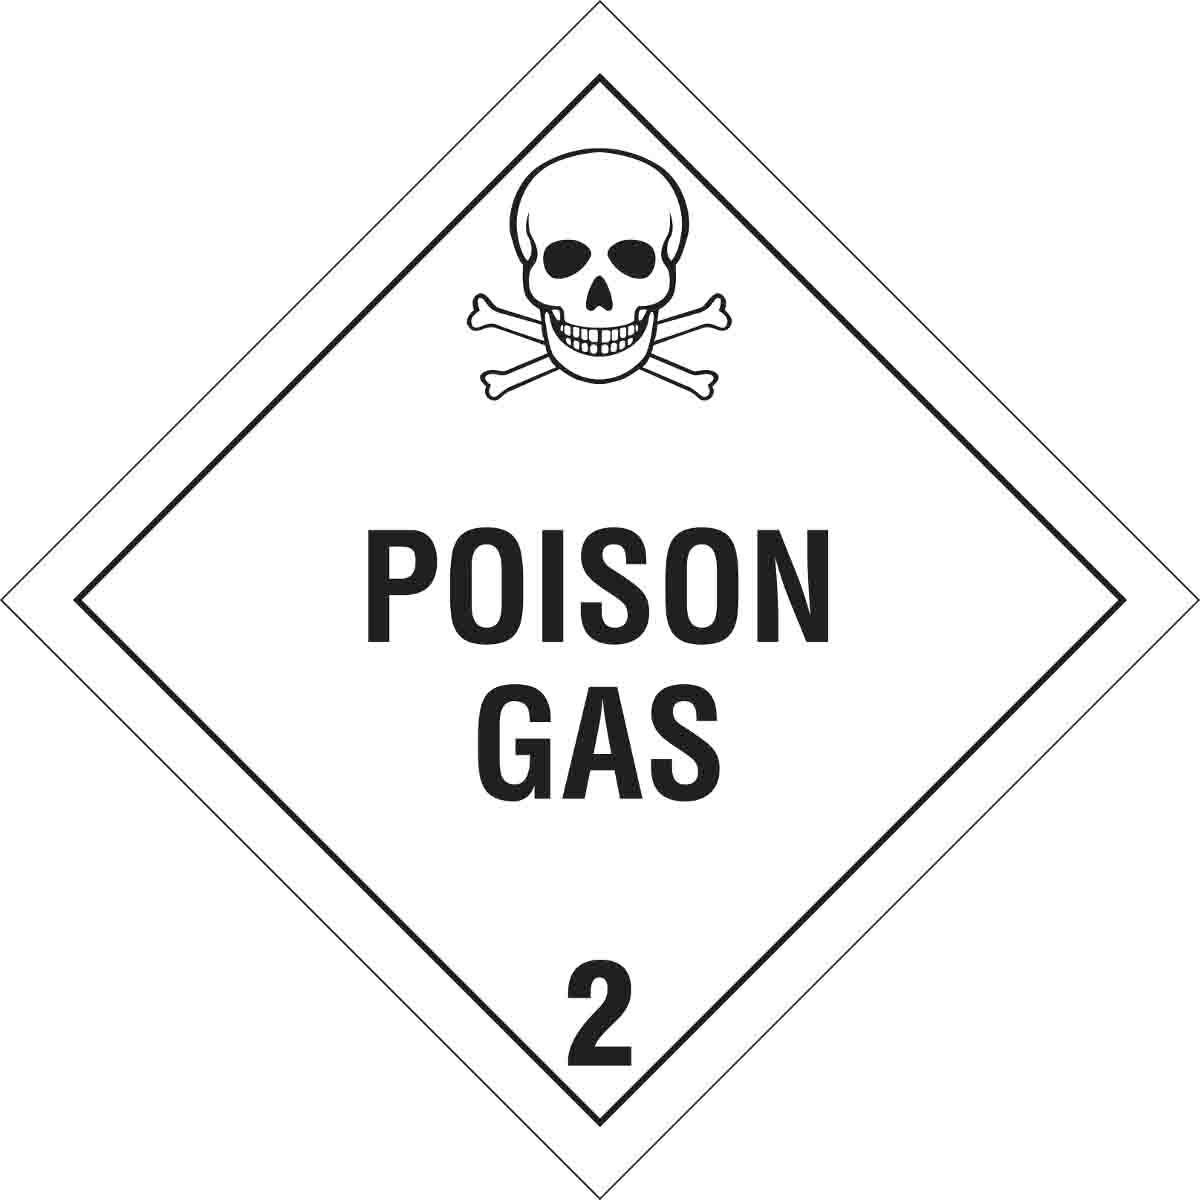 brady poison gas 2 sign